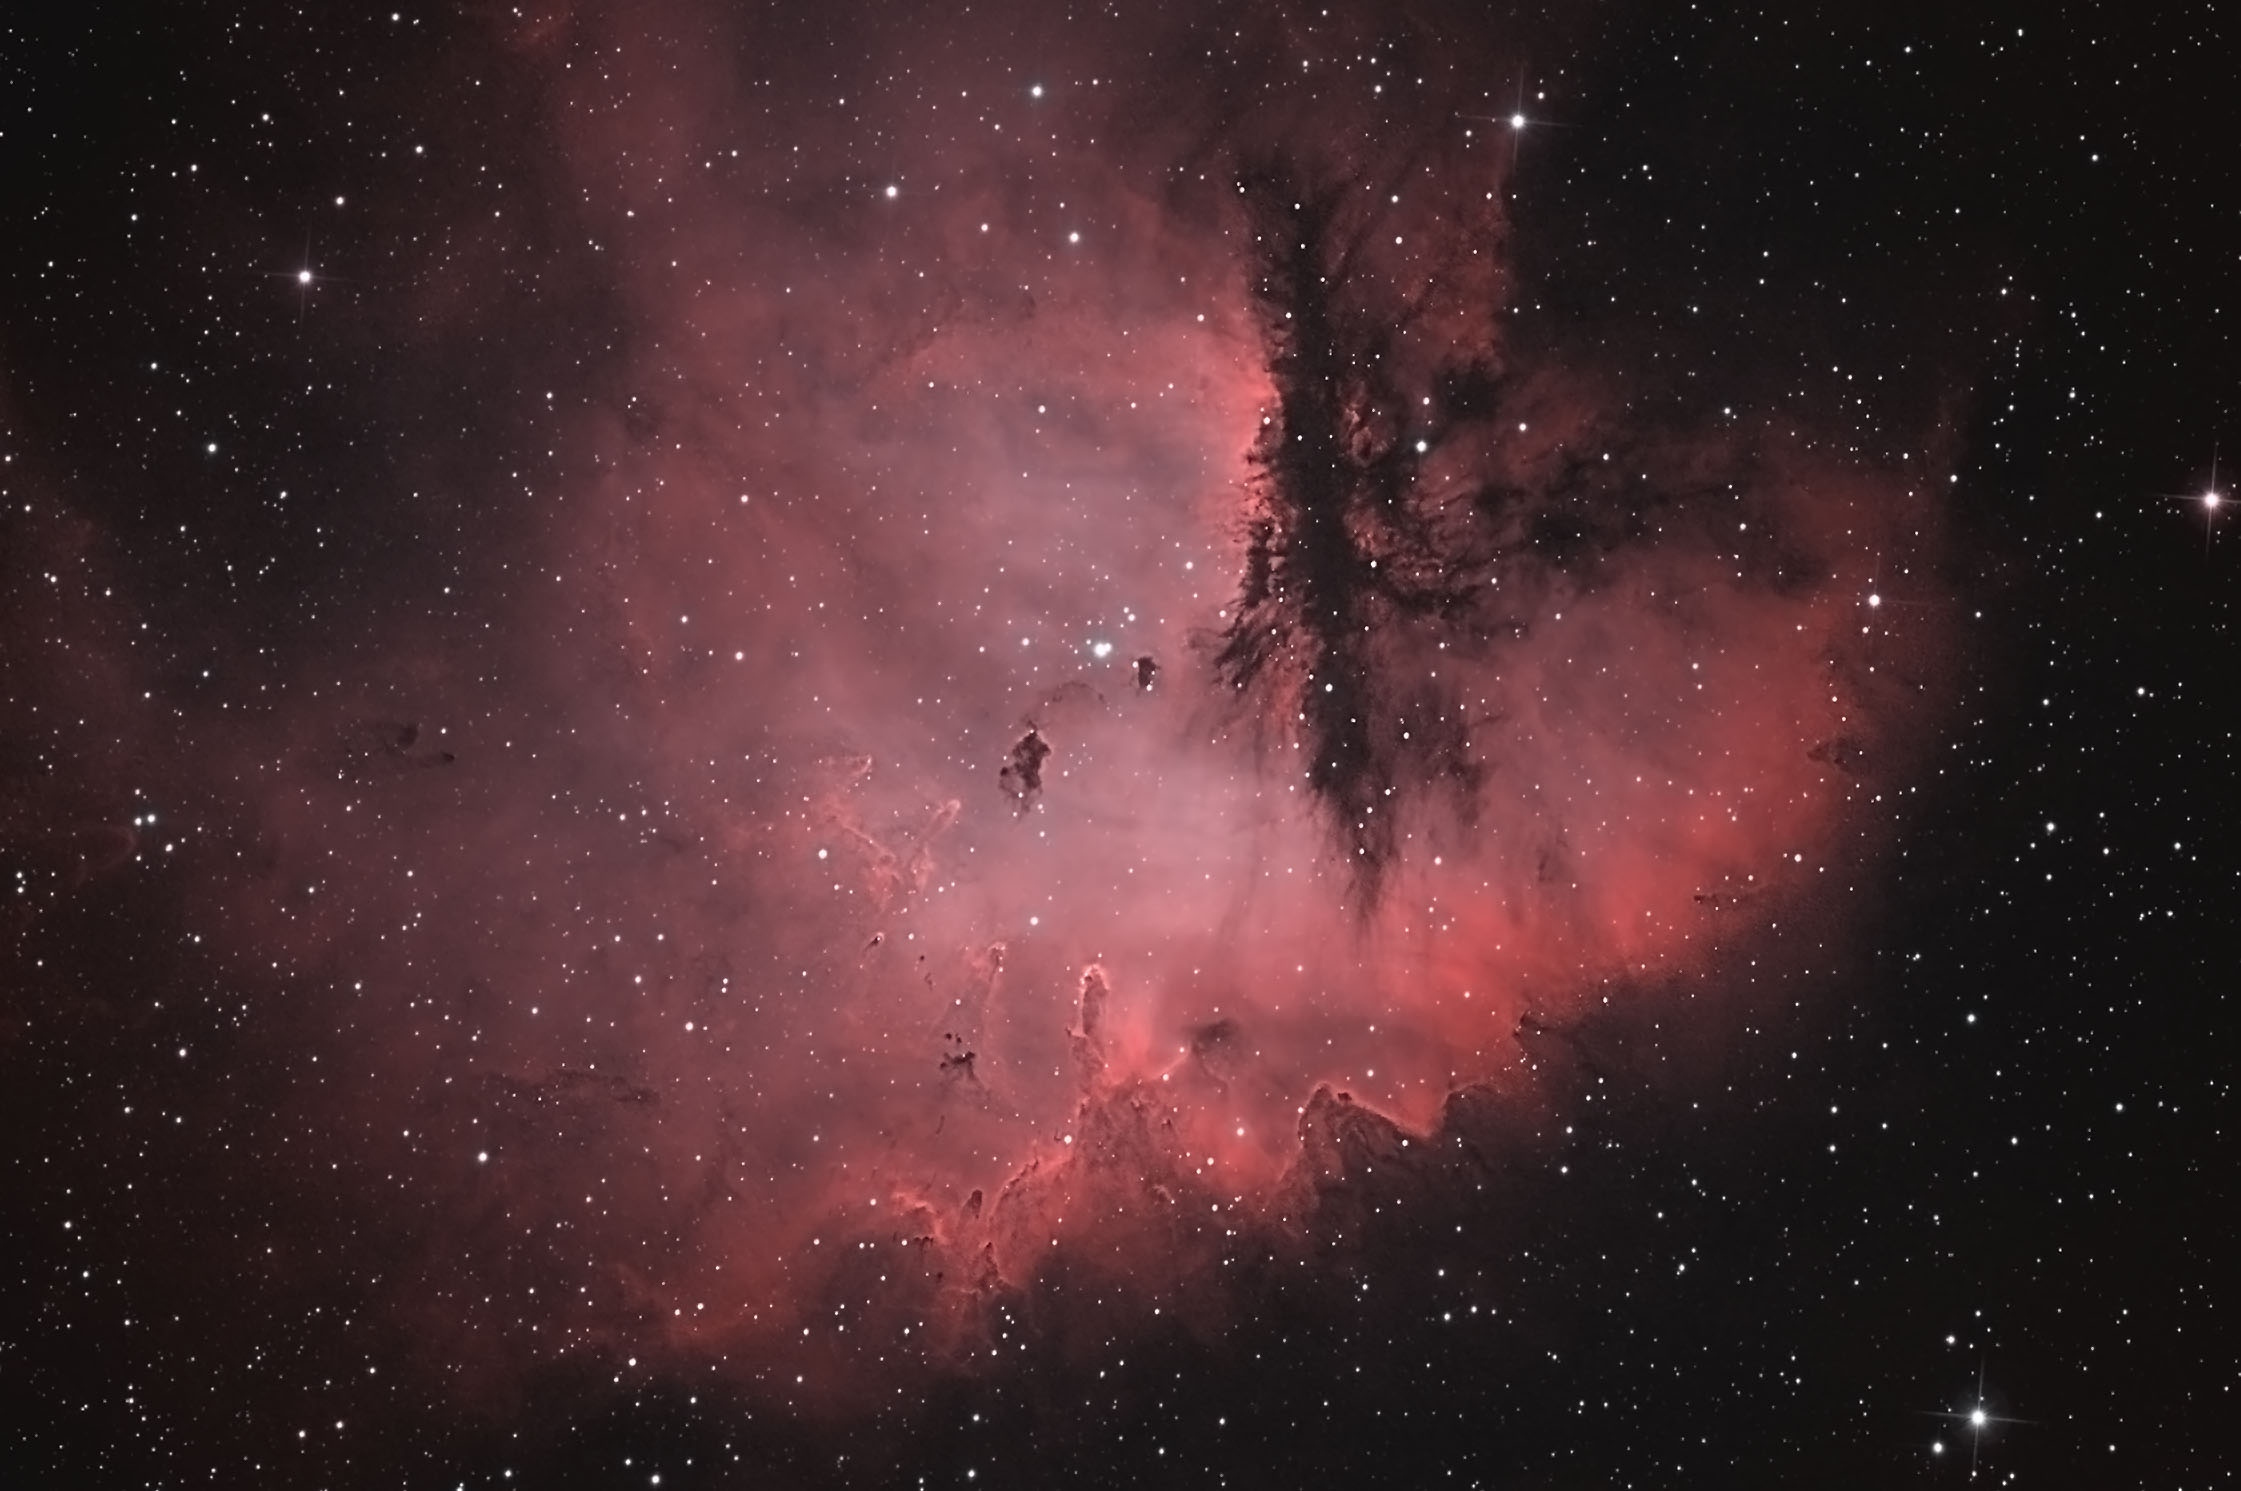 NGC281_HOO_siril_ps_final.jpg